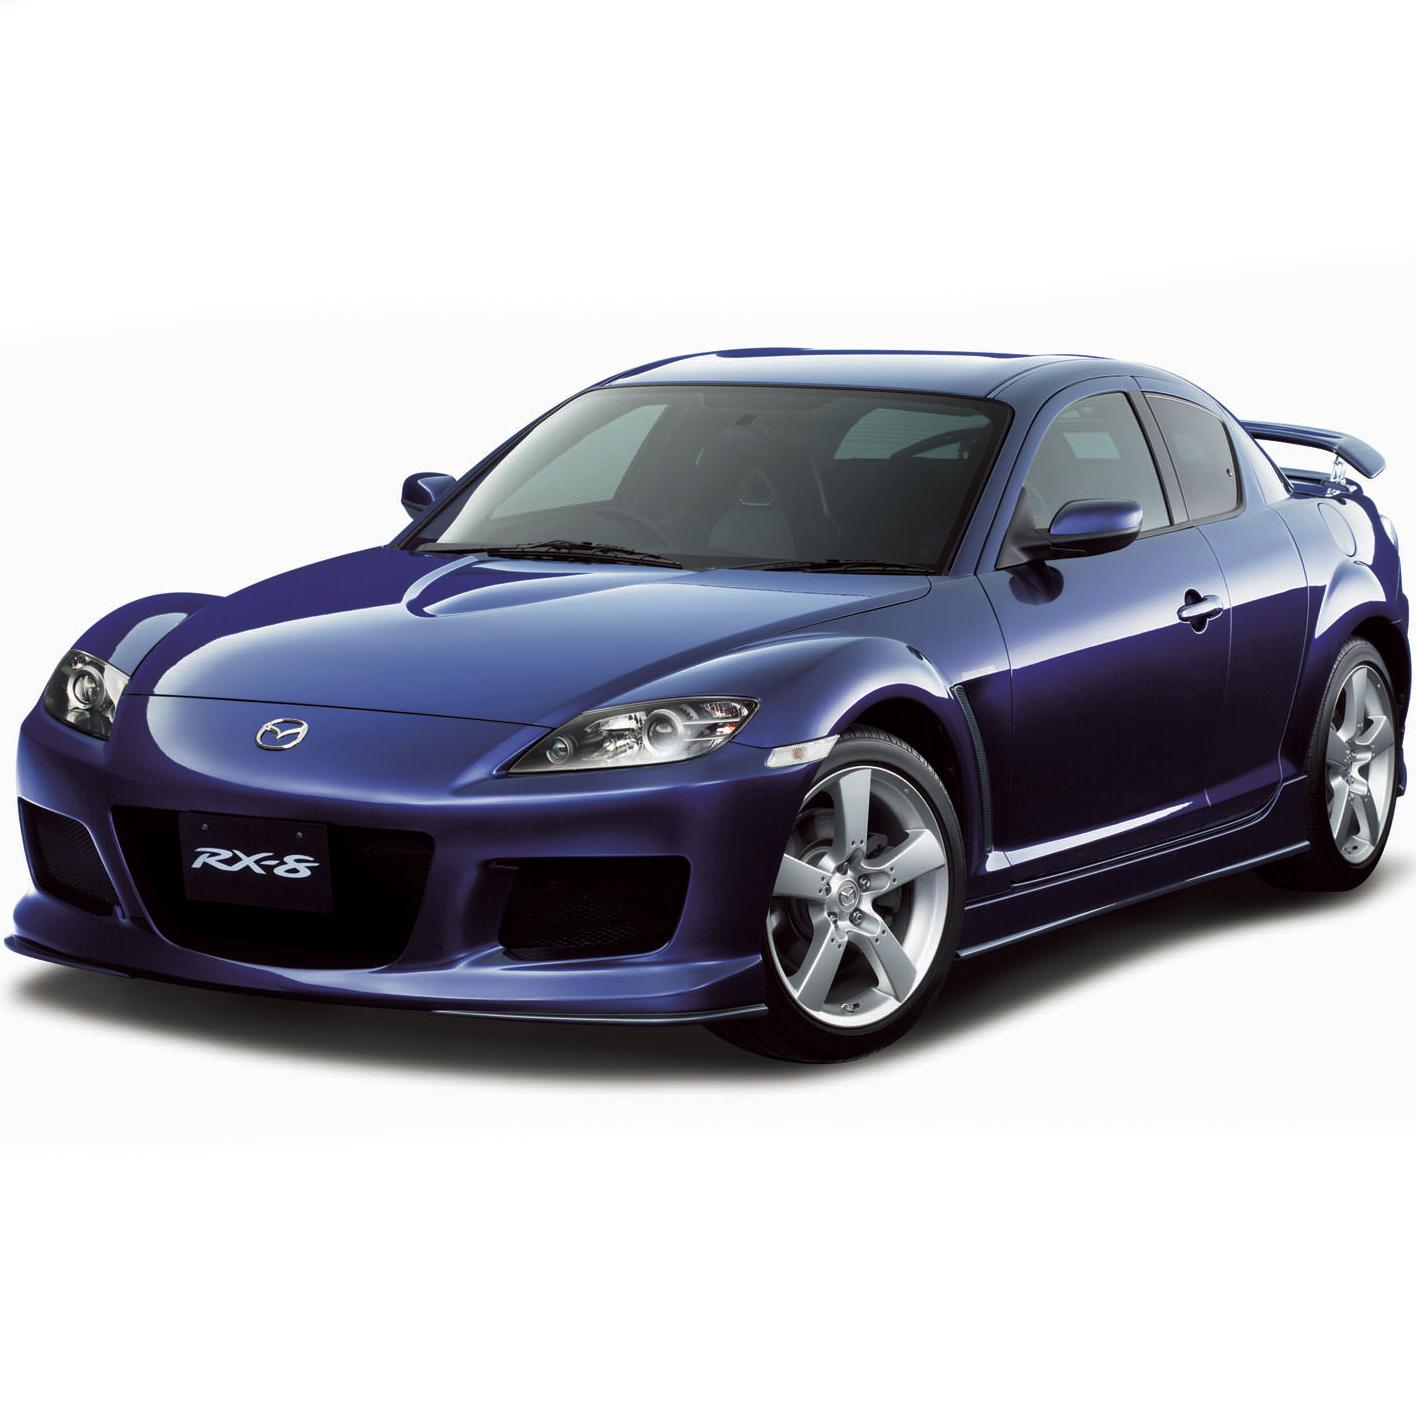 Mazda RX8 2003 Onwards